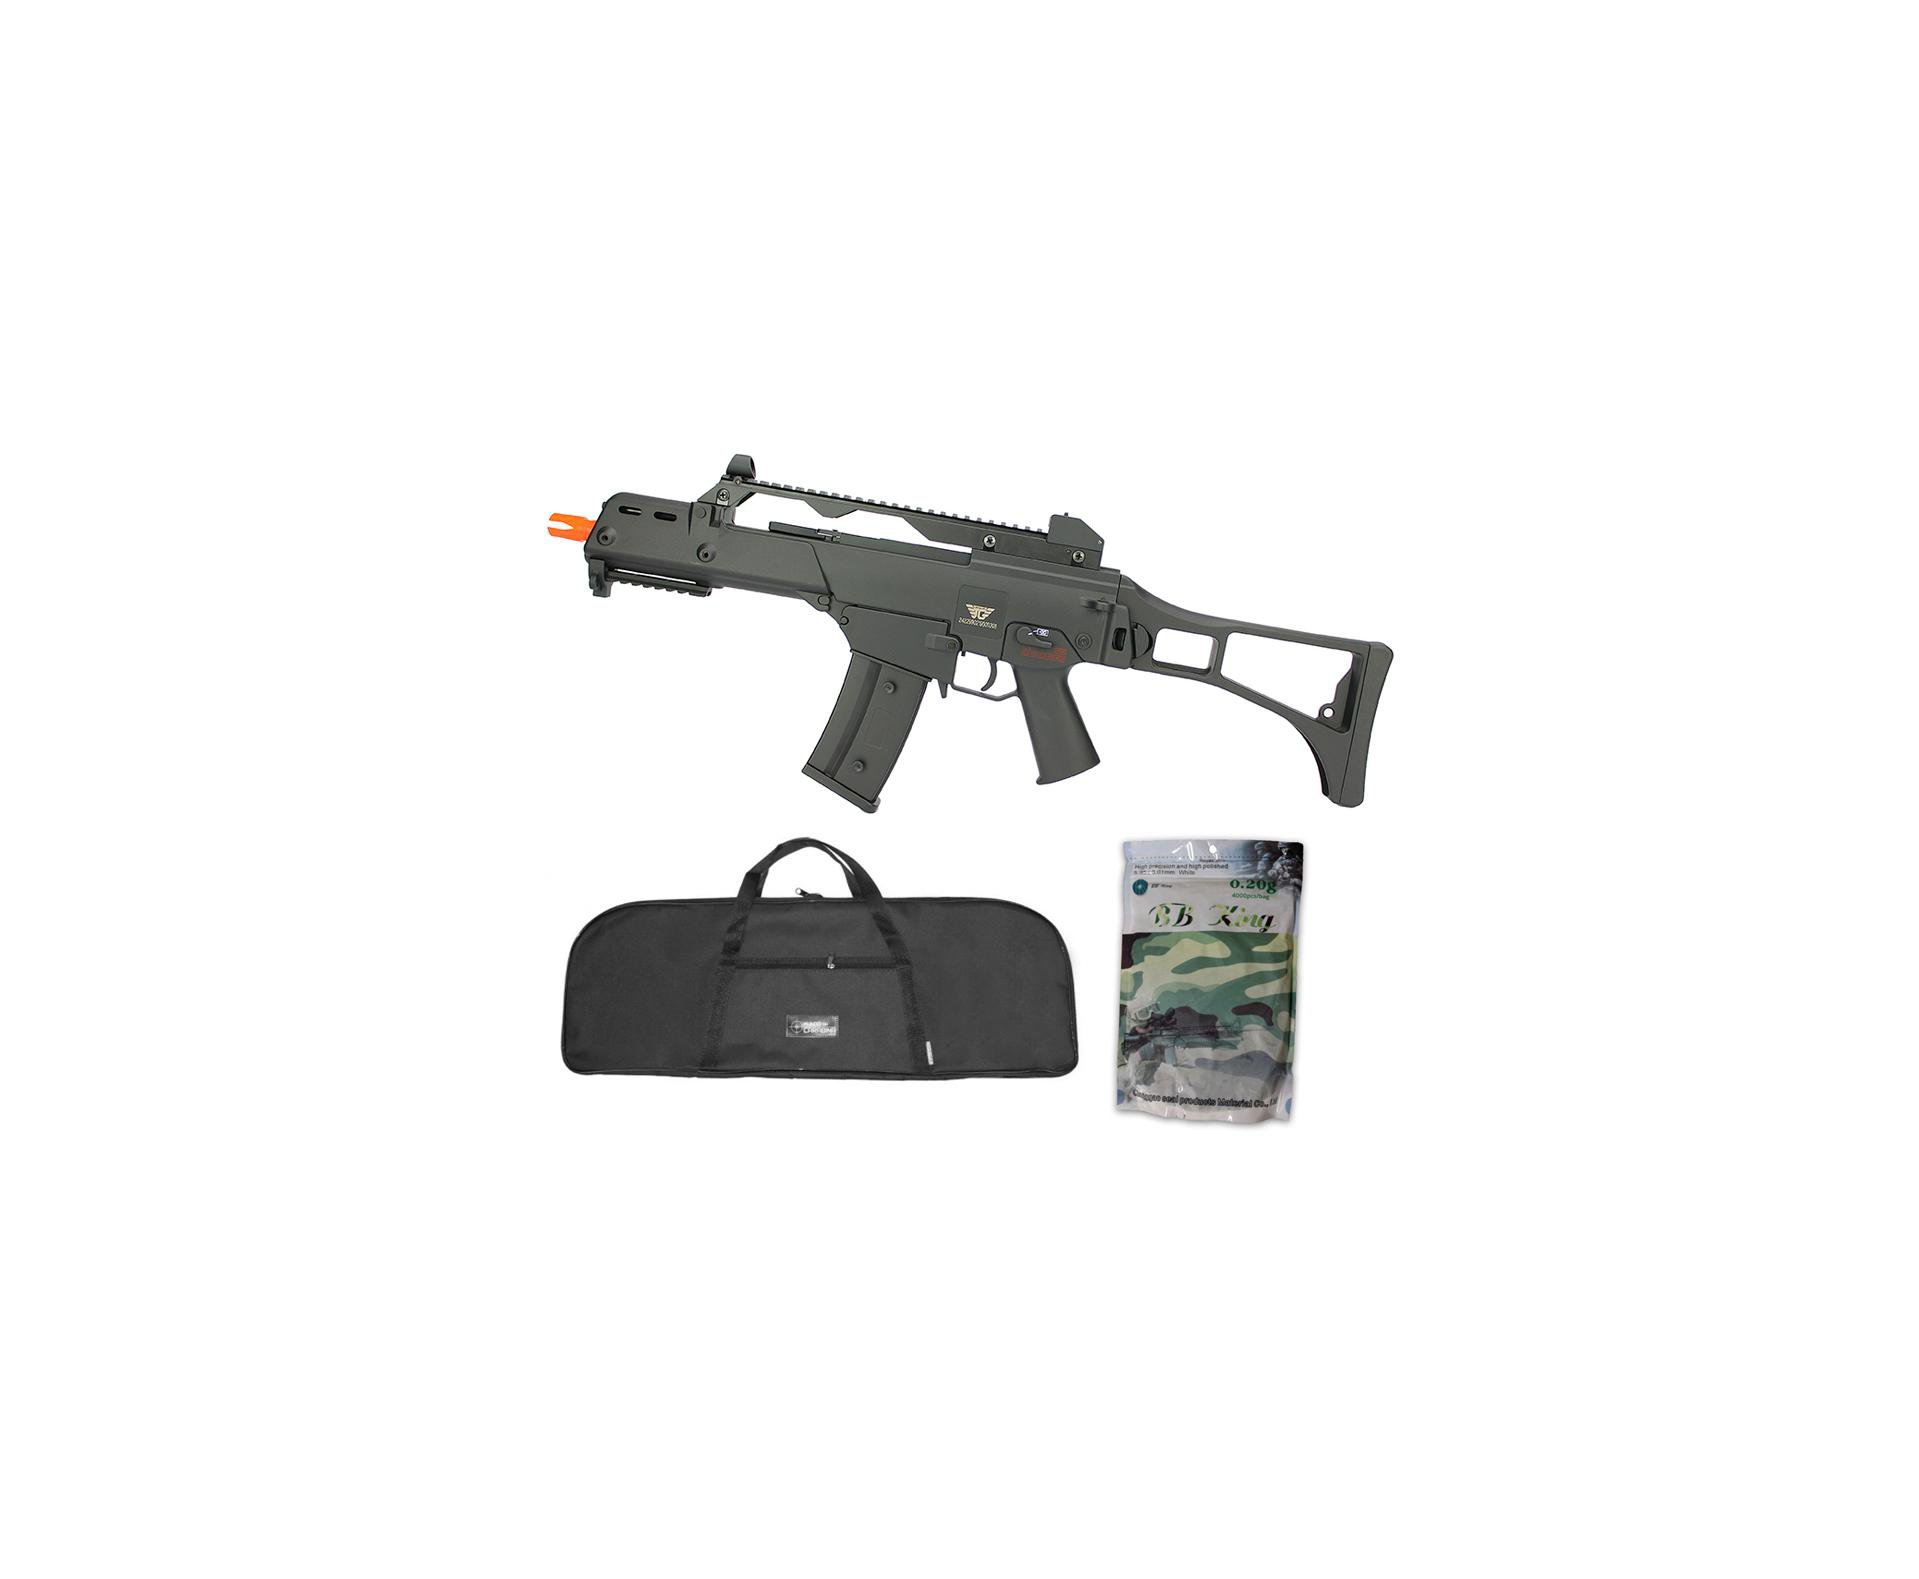 Rifle De Airsoft Aeg G36 Cal 6mm G608-0638 Jing Gong + Capa Simples + Bbs 0,20g 4000uni